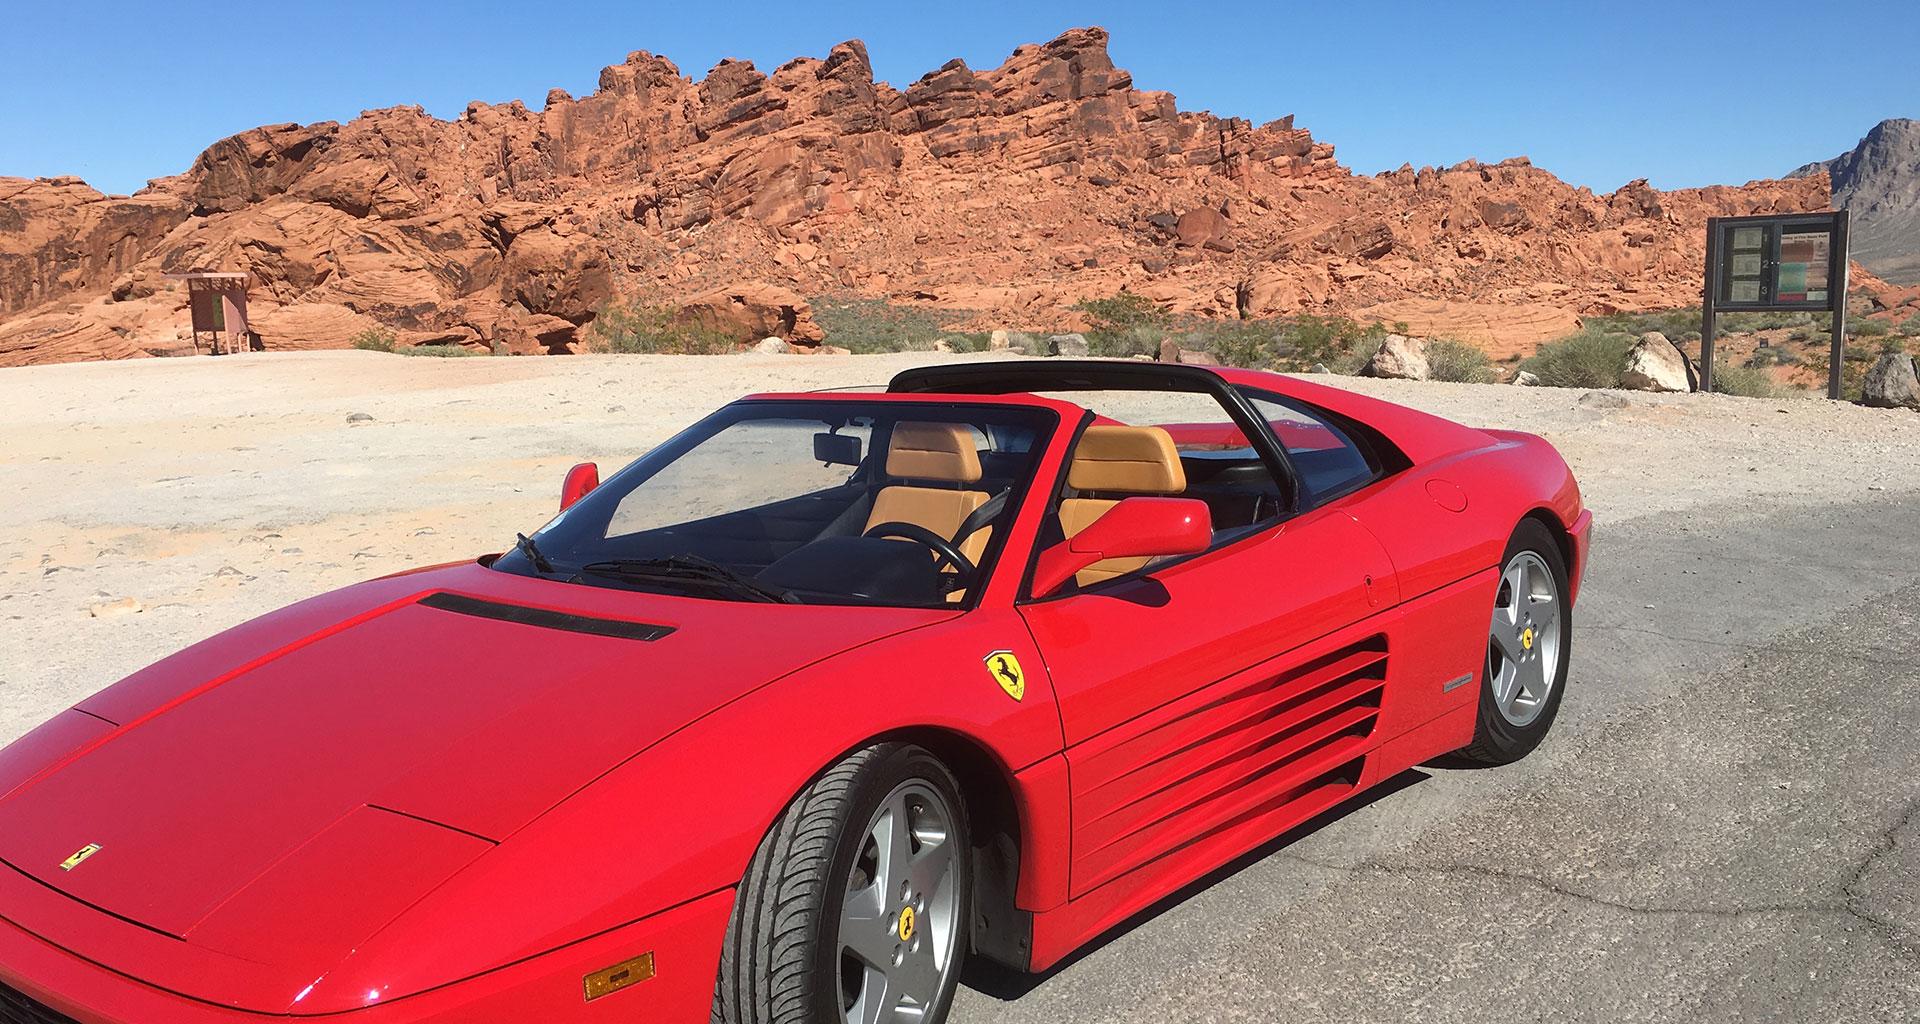 348 Ferrari Club Las Vegas Red Rock